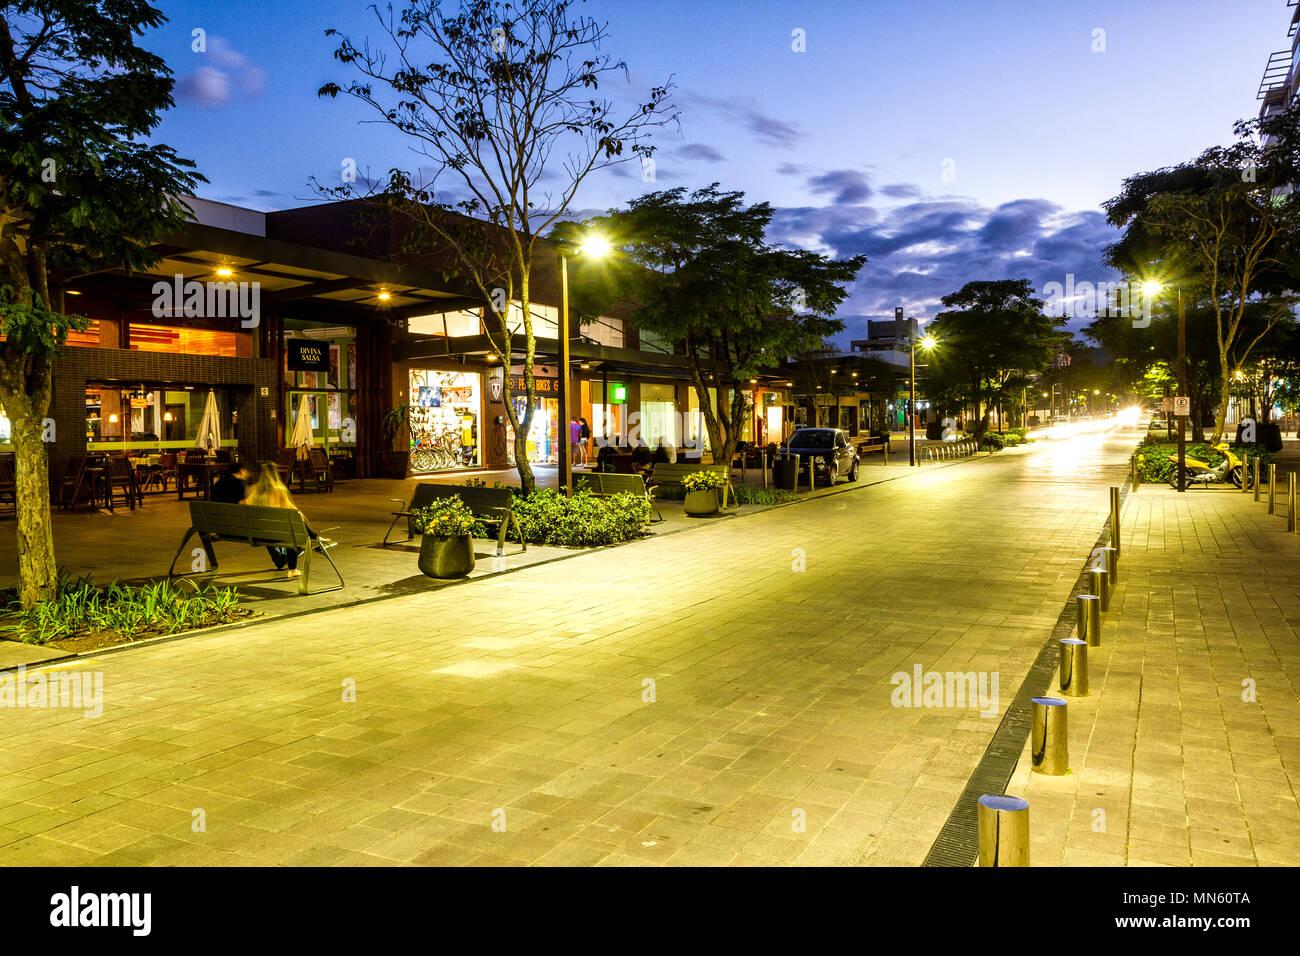 Street in Passeio Pedra Branca neighborhood at evening. Palhoca, Santa Catarina, Brazil. - Stock Image